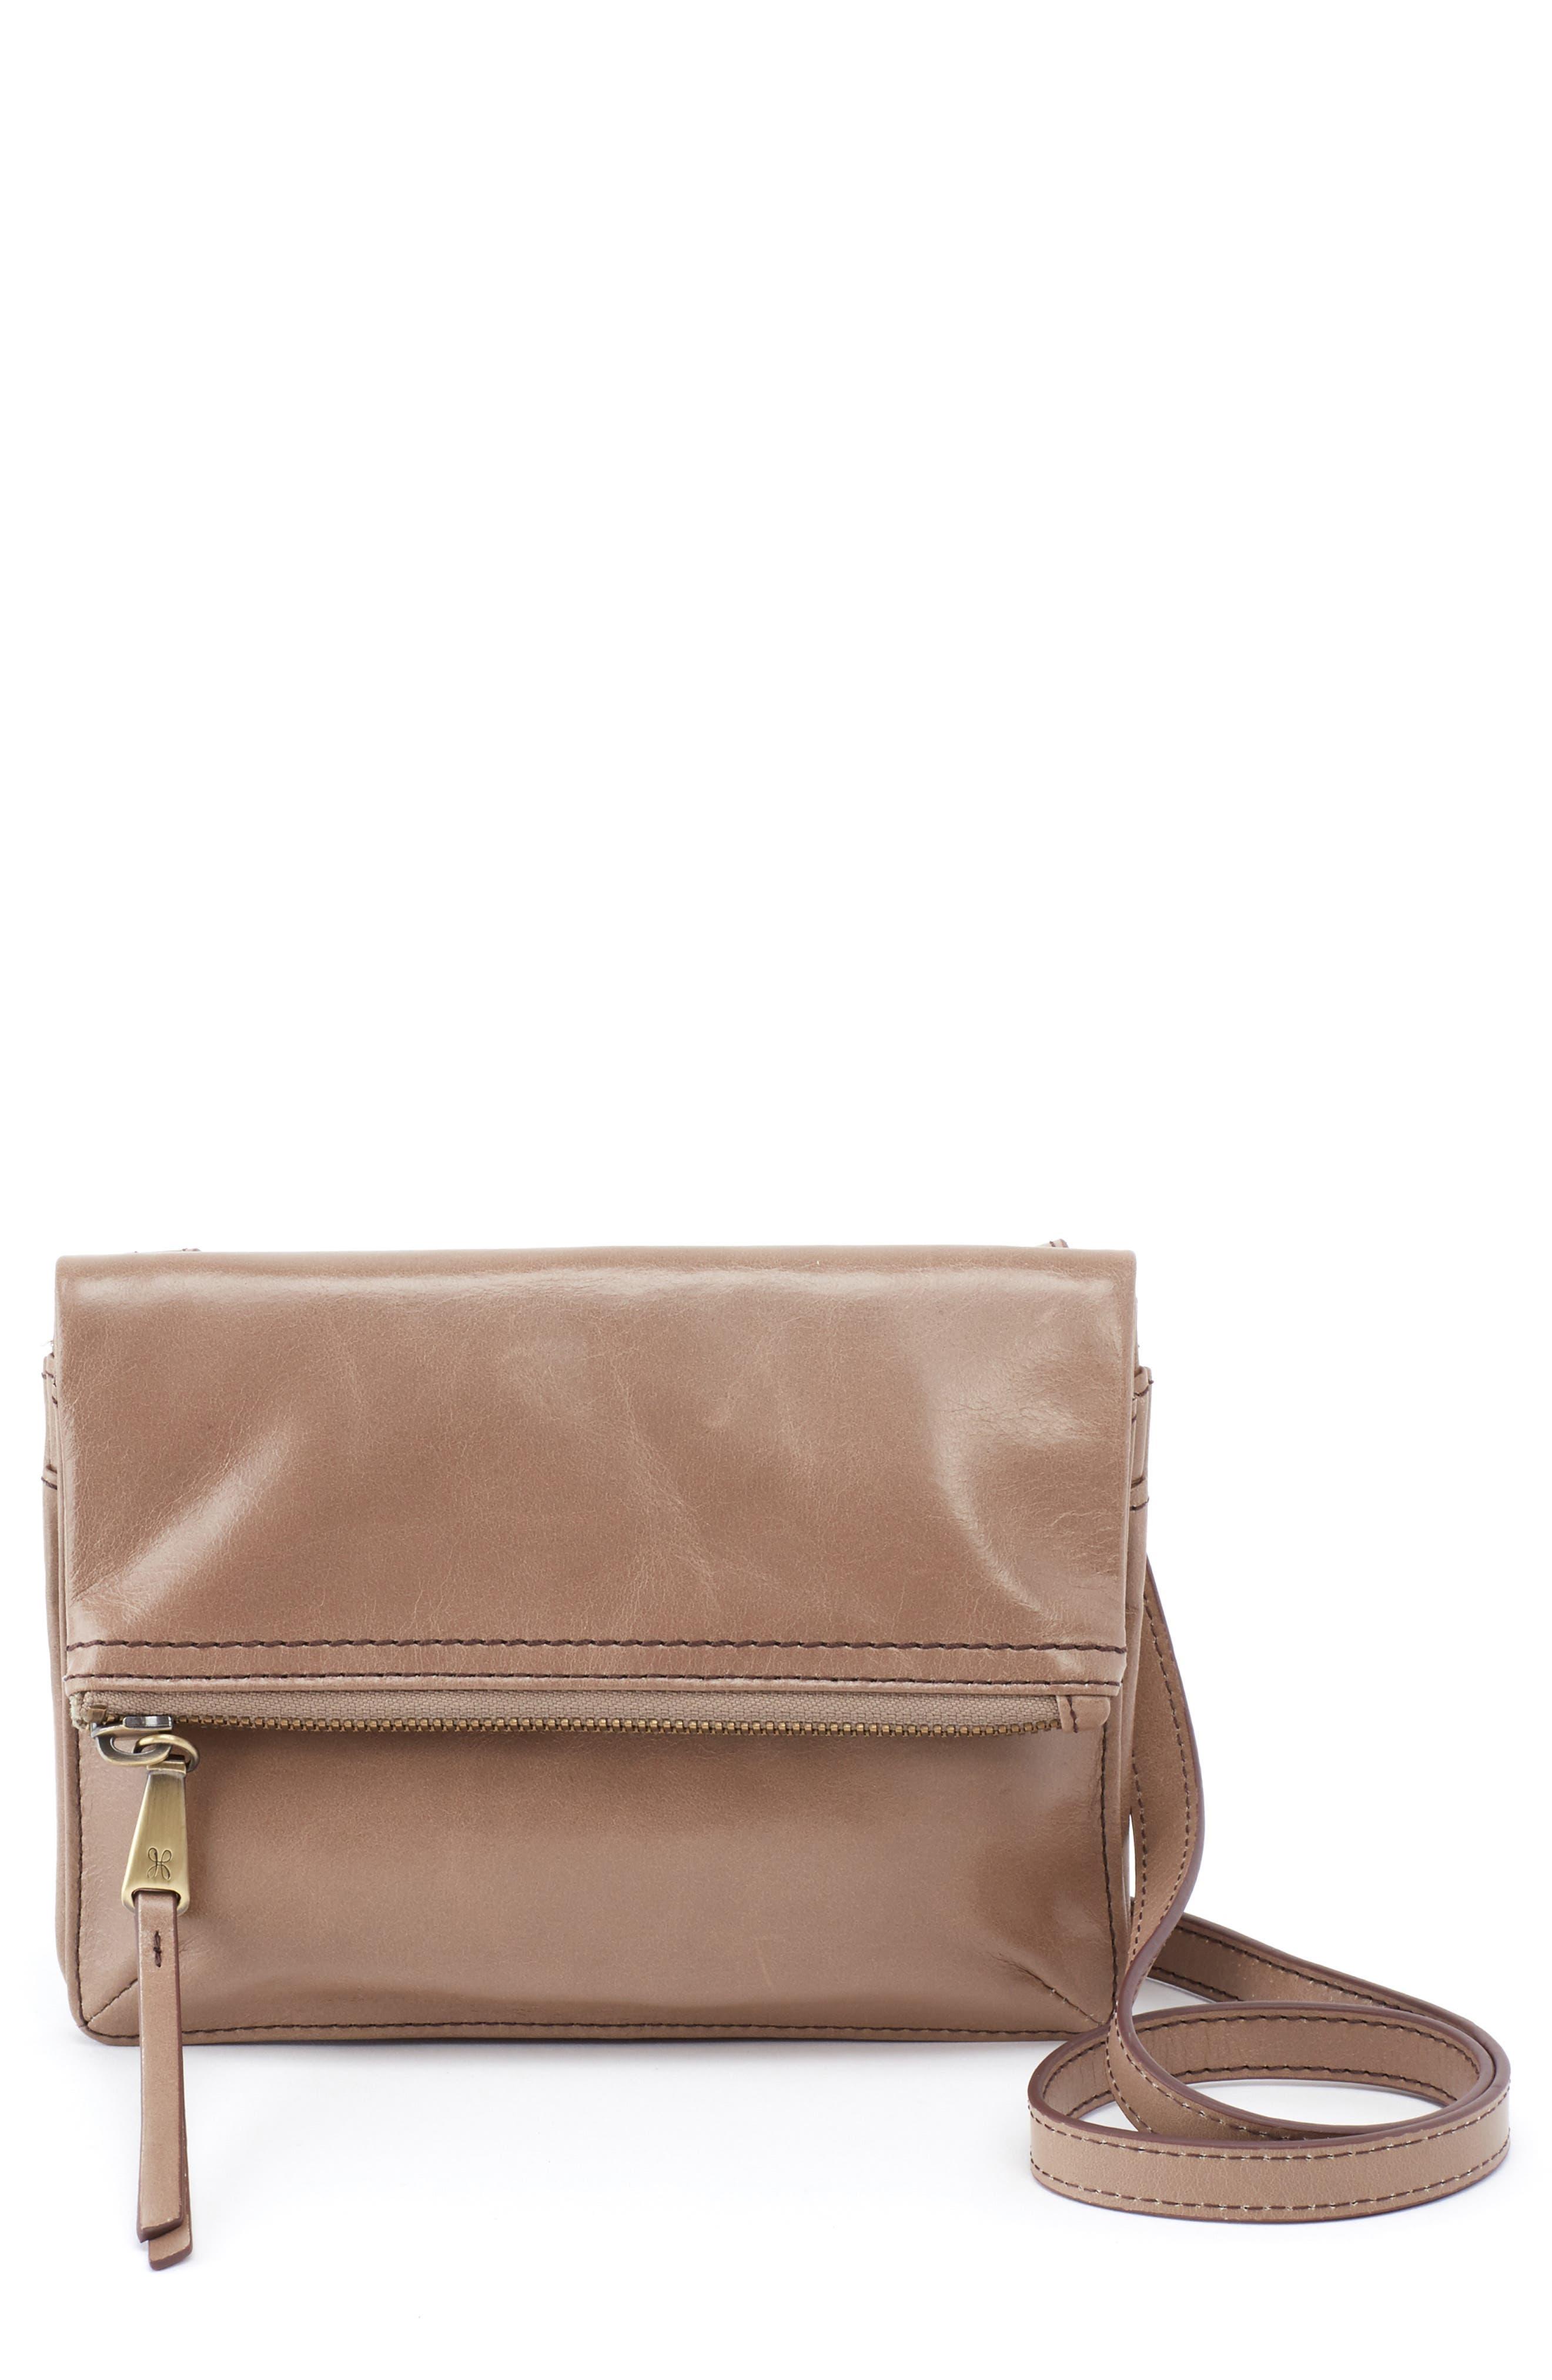 Glade Leather Crossbody Bag, Main, color, COBBLESTONE